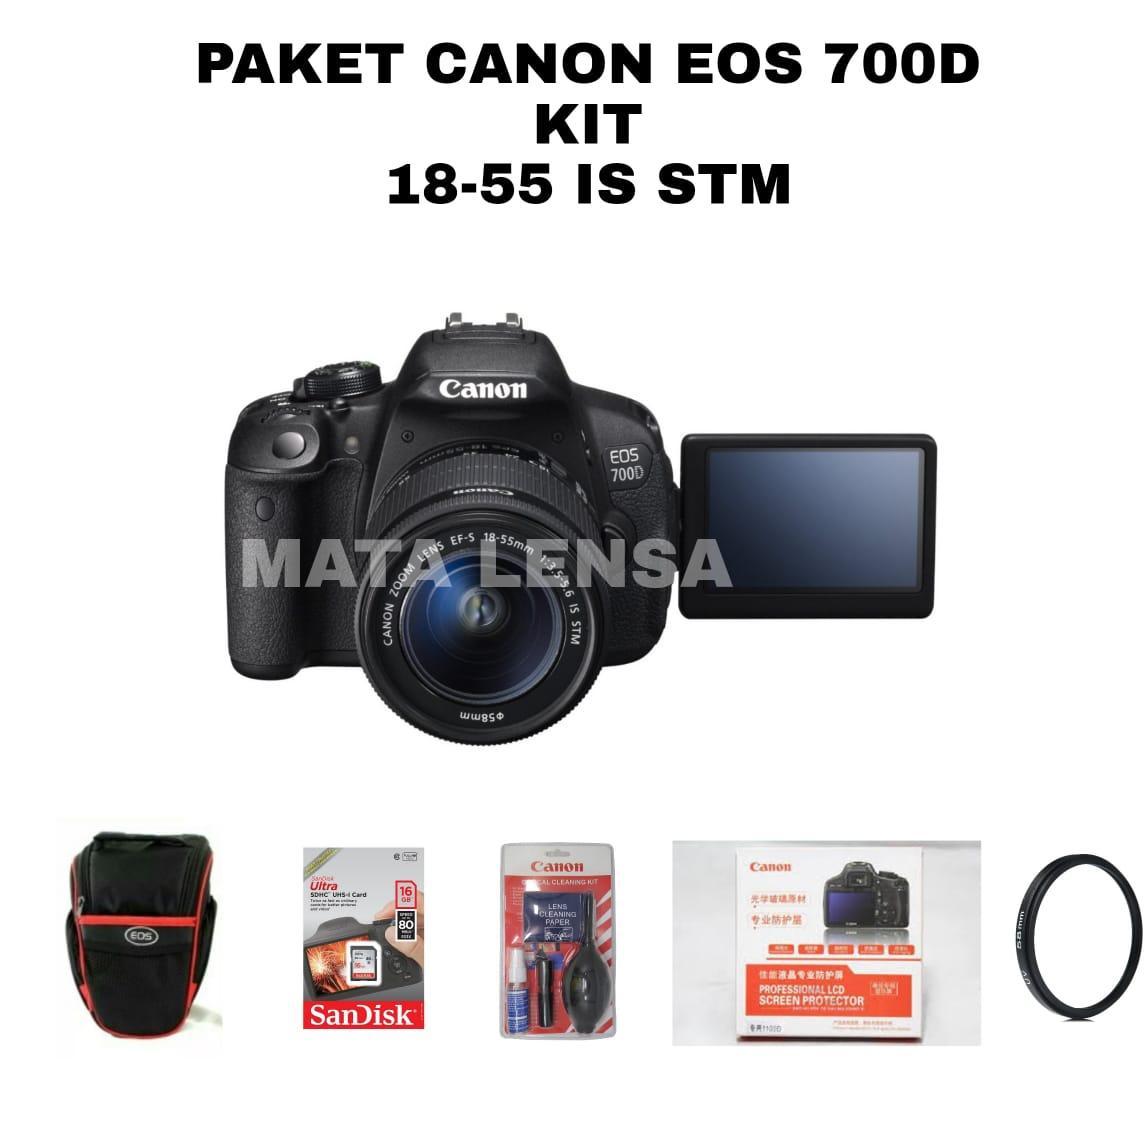 Spek Harga Canon Eos 1200d Is Kamera Dslr Lensa Kit 18 55 Mm Mp 55mm Promo Paket Camera 700d Stm Original Garansi 8497800 Update New